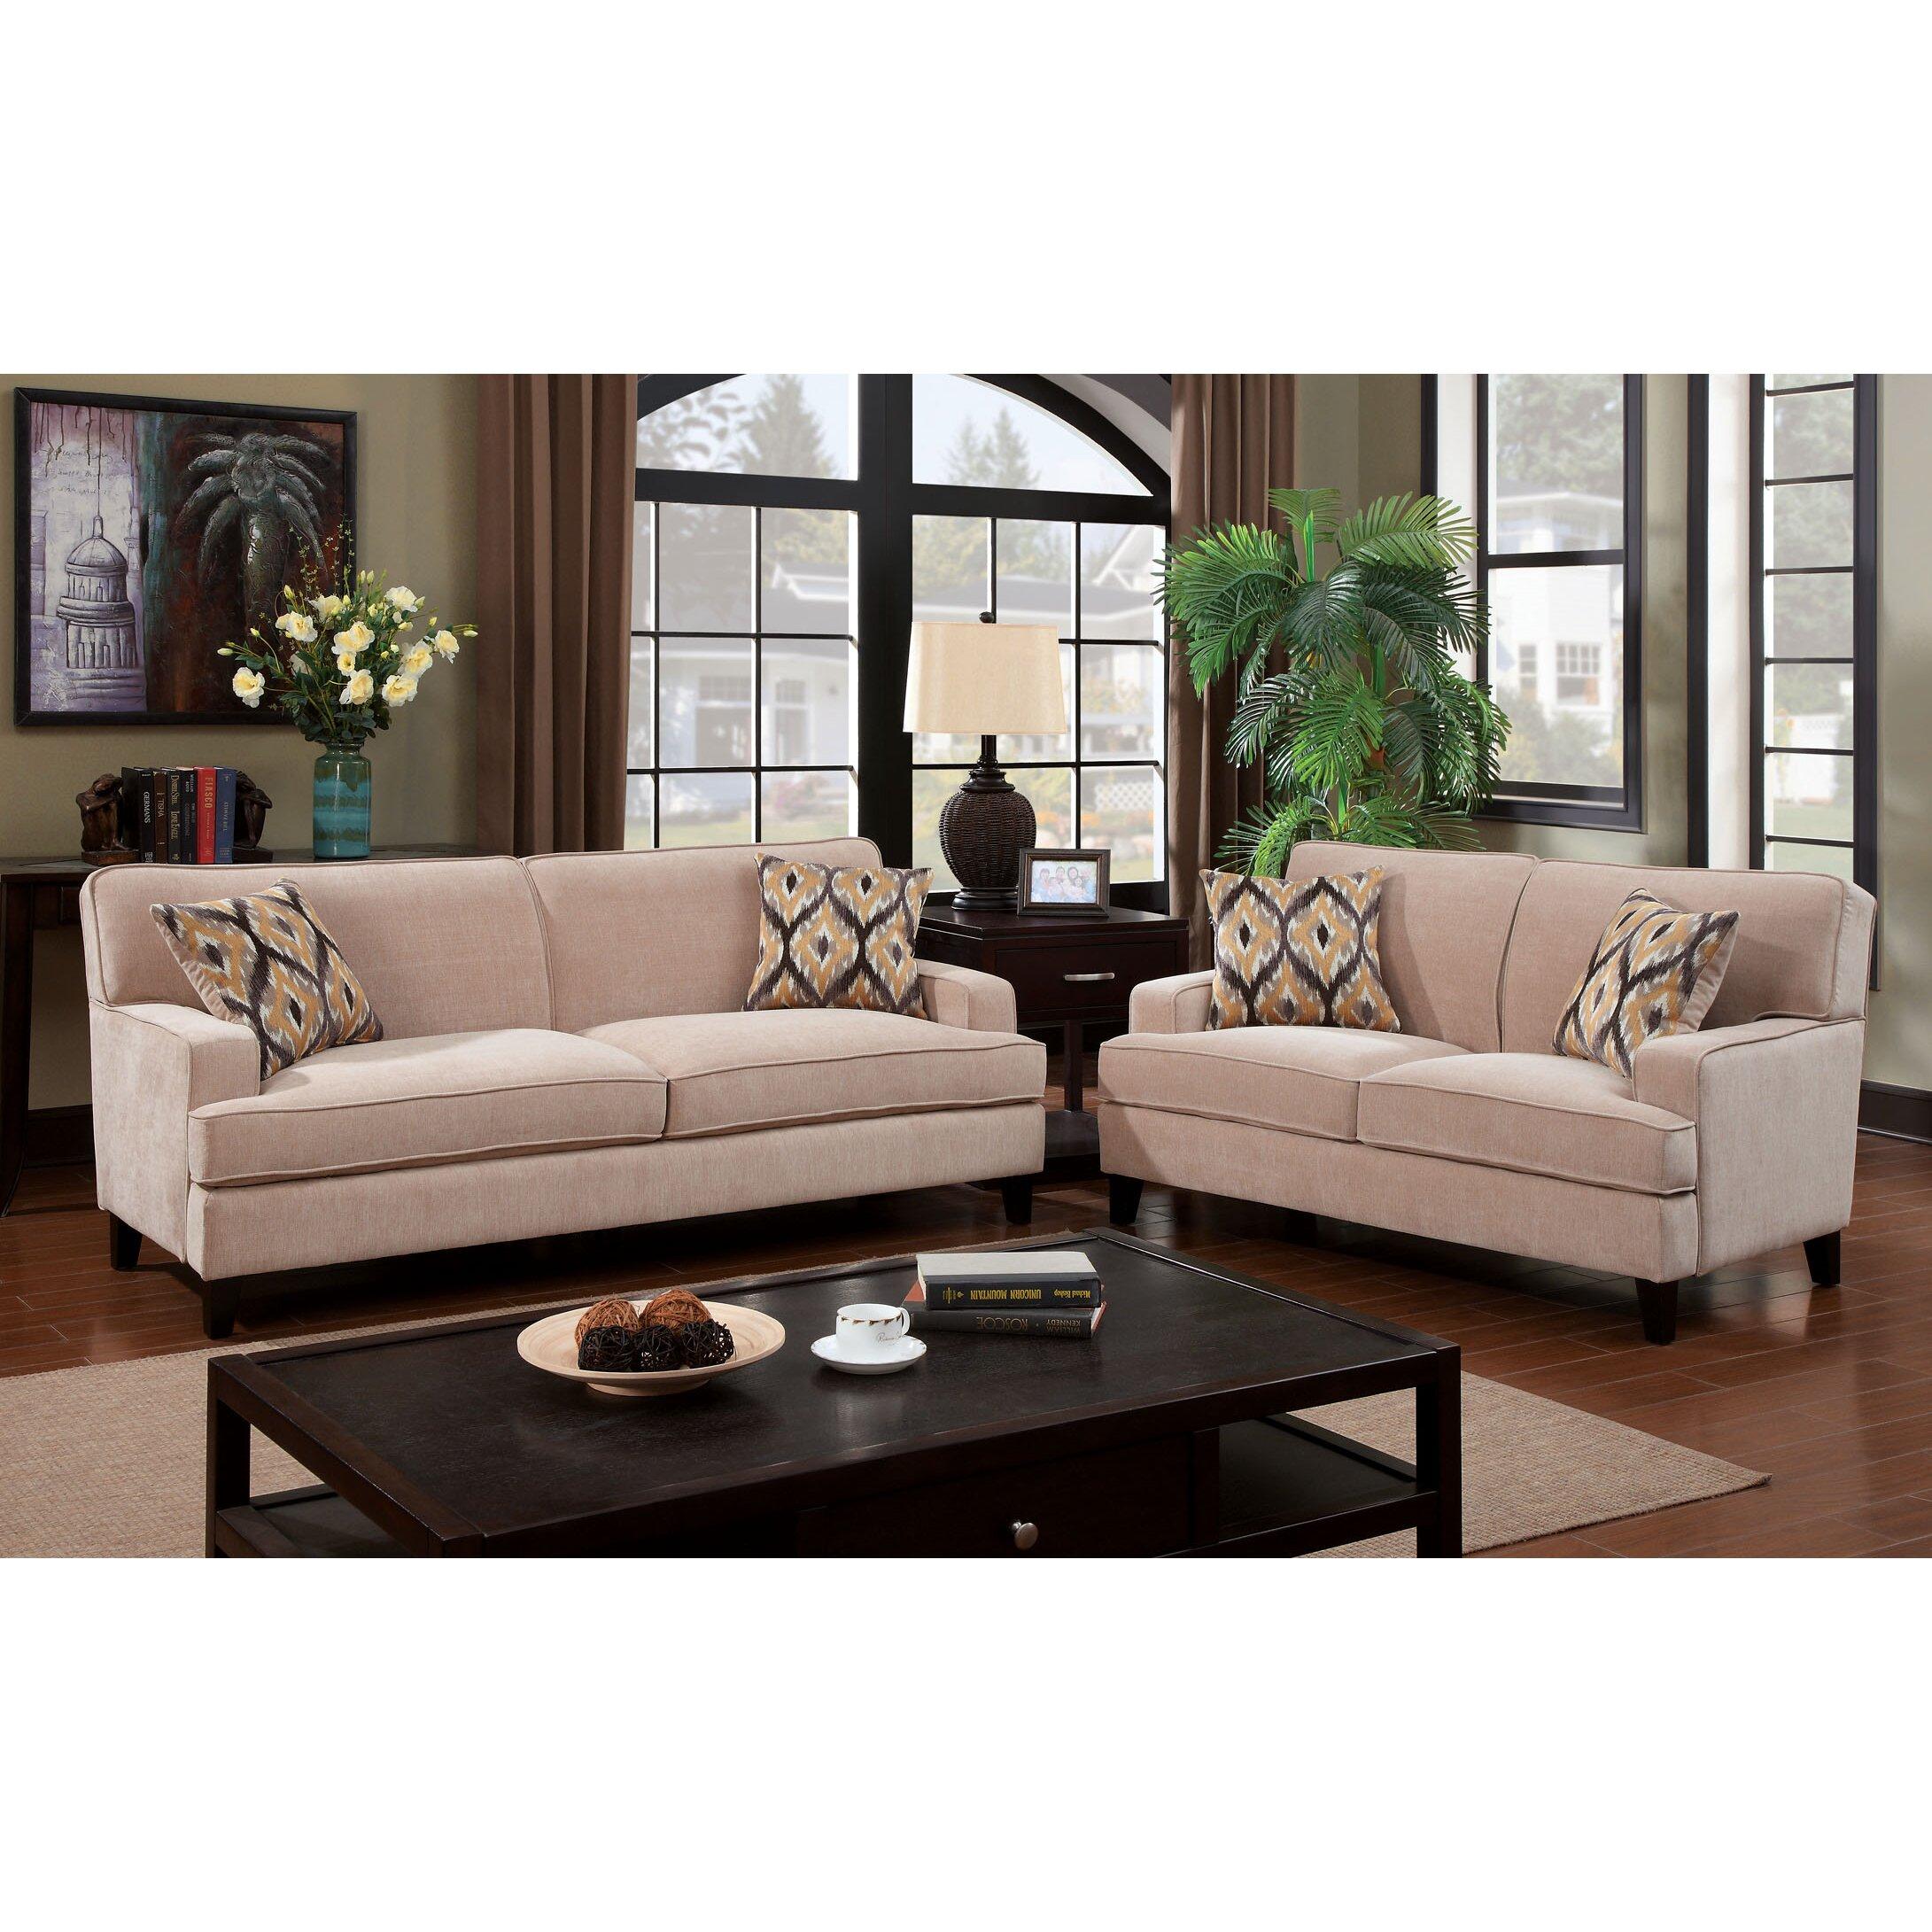 Hokku designs leyna modern standard sofa reviews wayfair for Hokku designs living room furniture